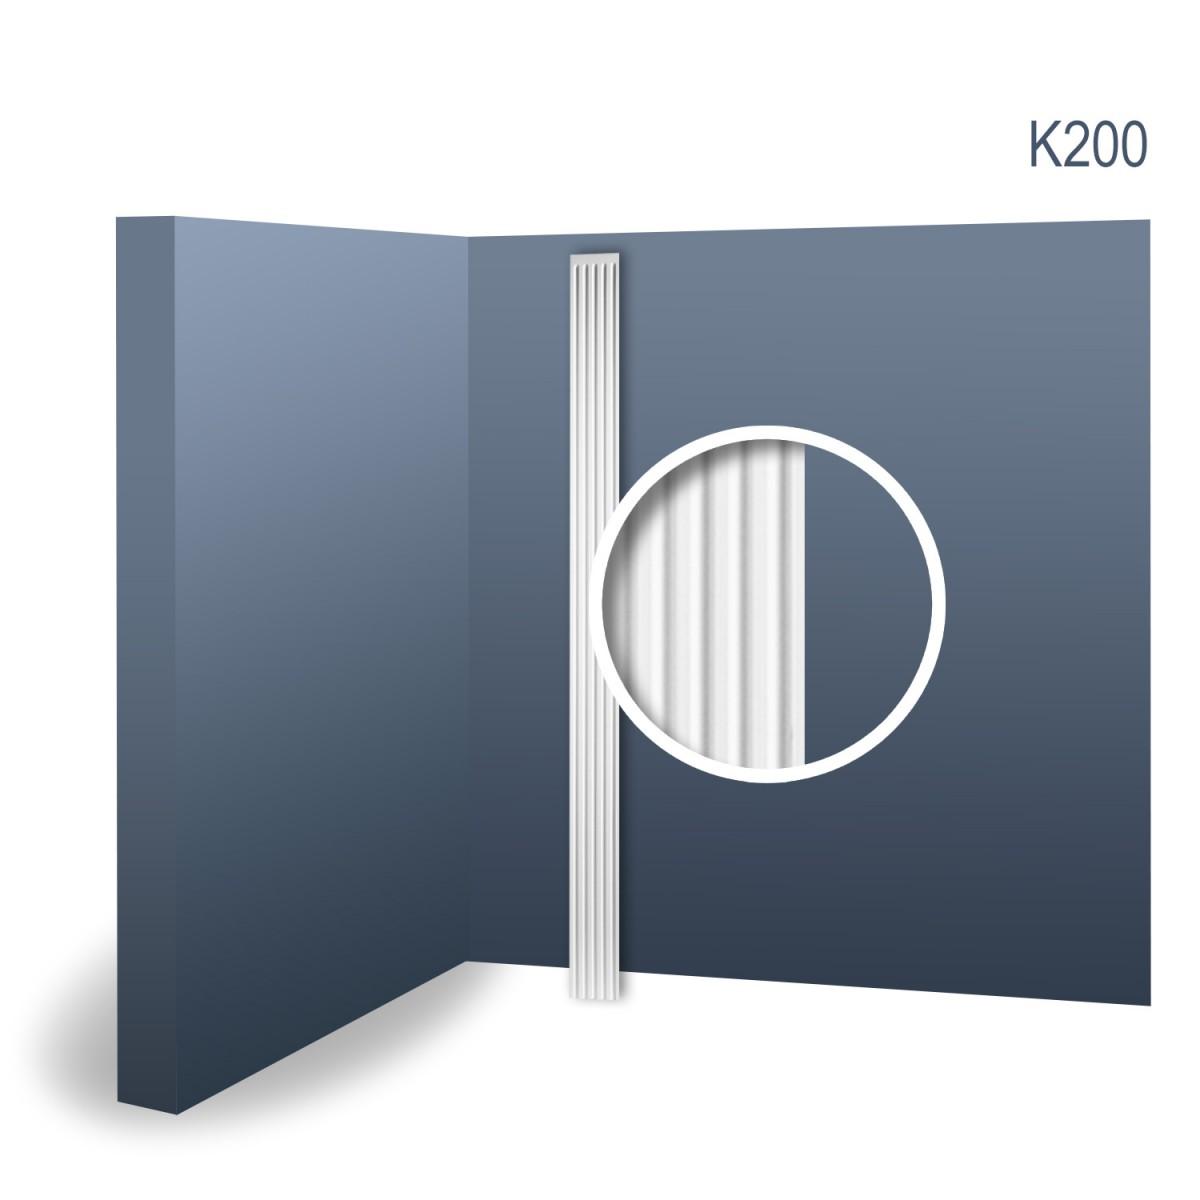 Pilastru Luxxus K200, Dimensiuni: 13.6 X 1.9 X 200 cm, Orac Decor